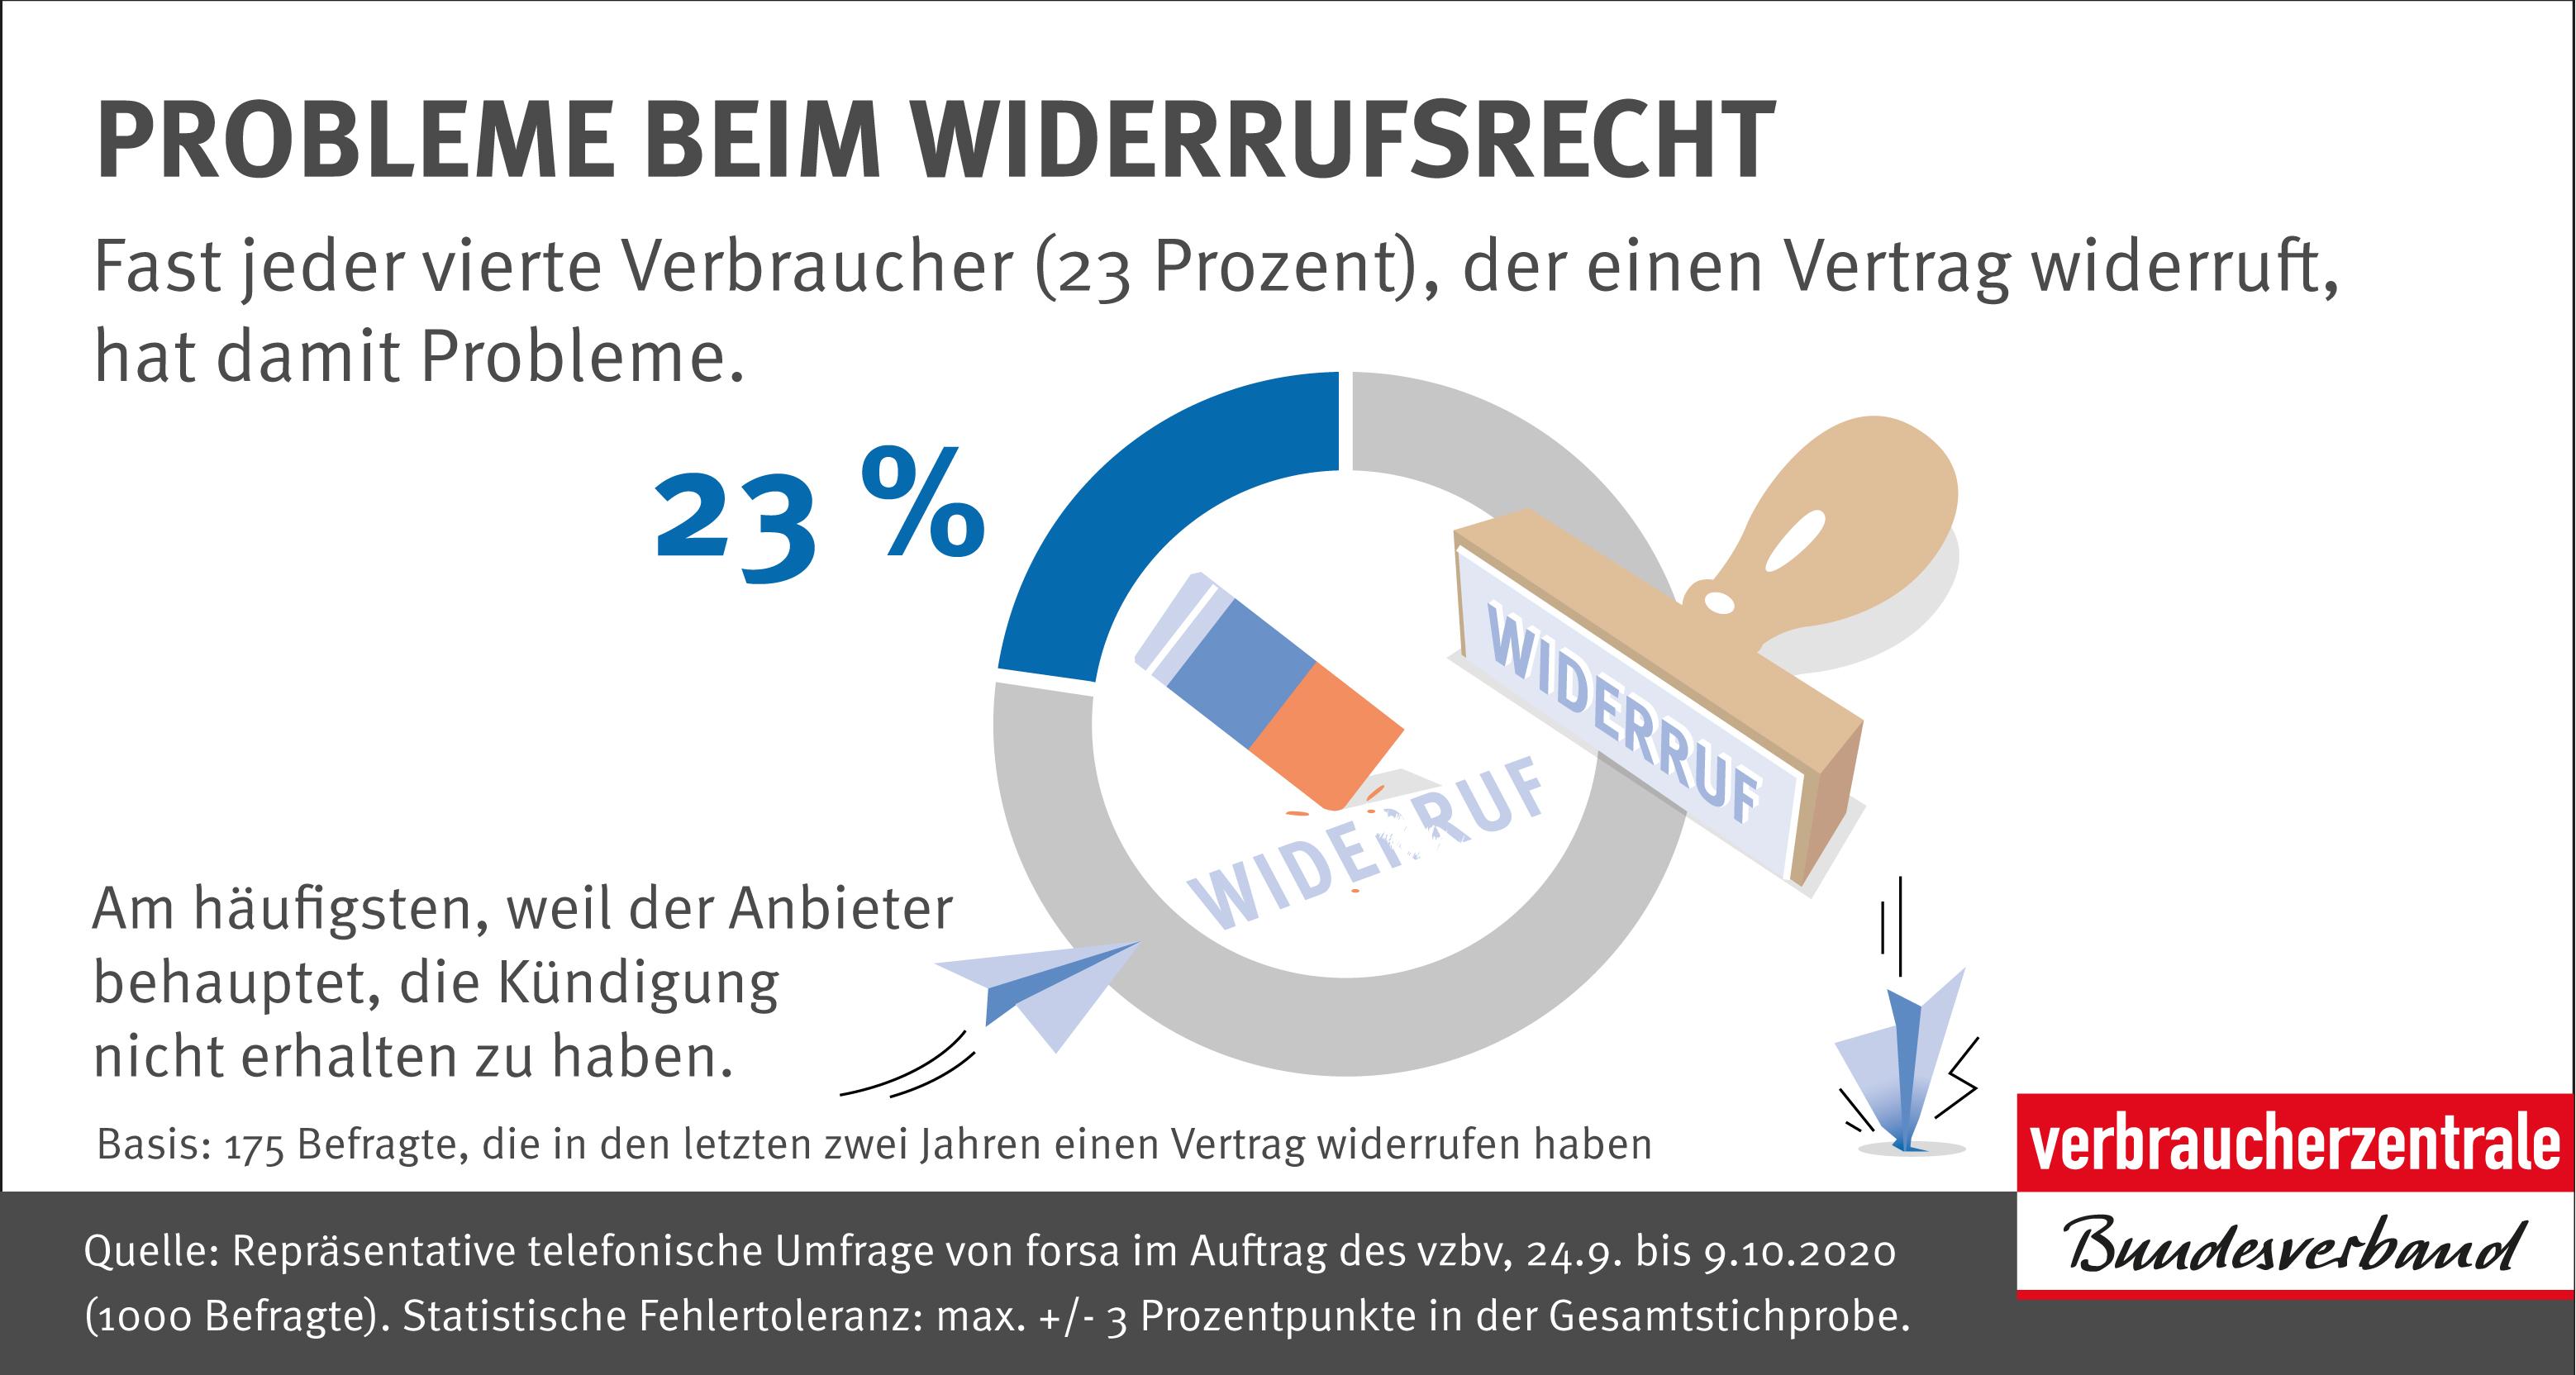 Probleme beim Widerrufsrecht   Infografik des vzbv   November 2020